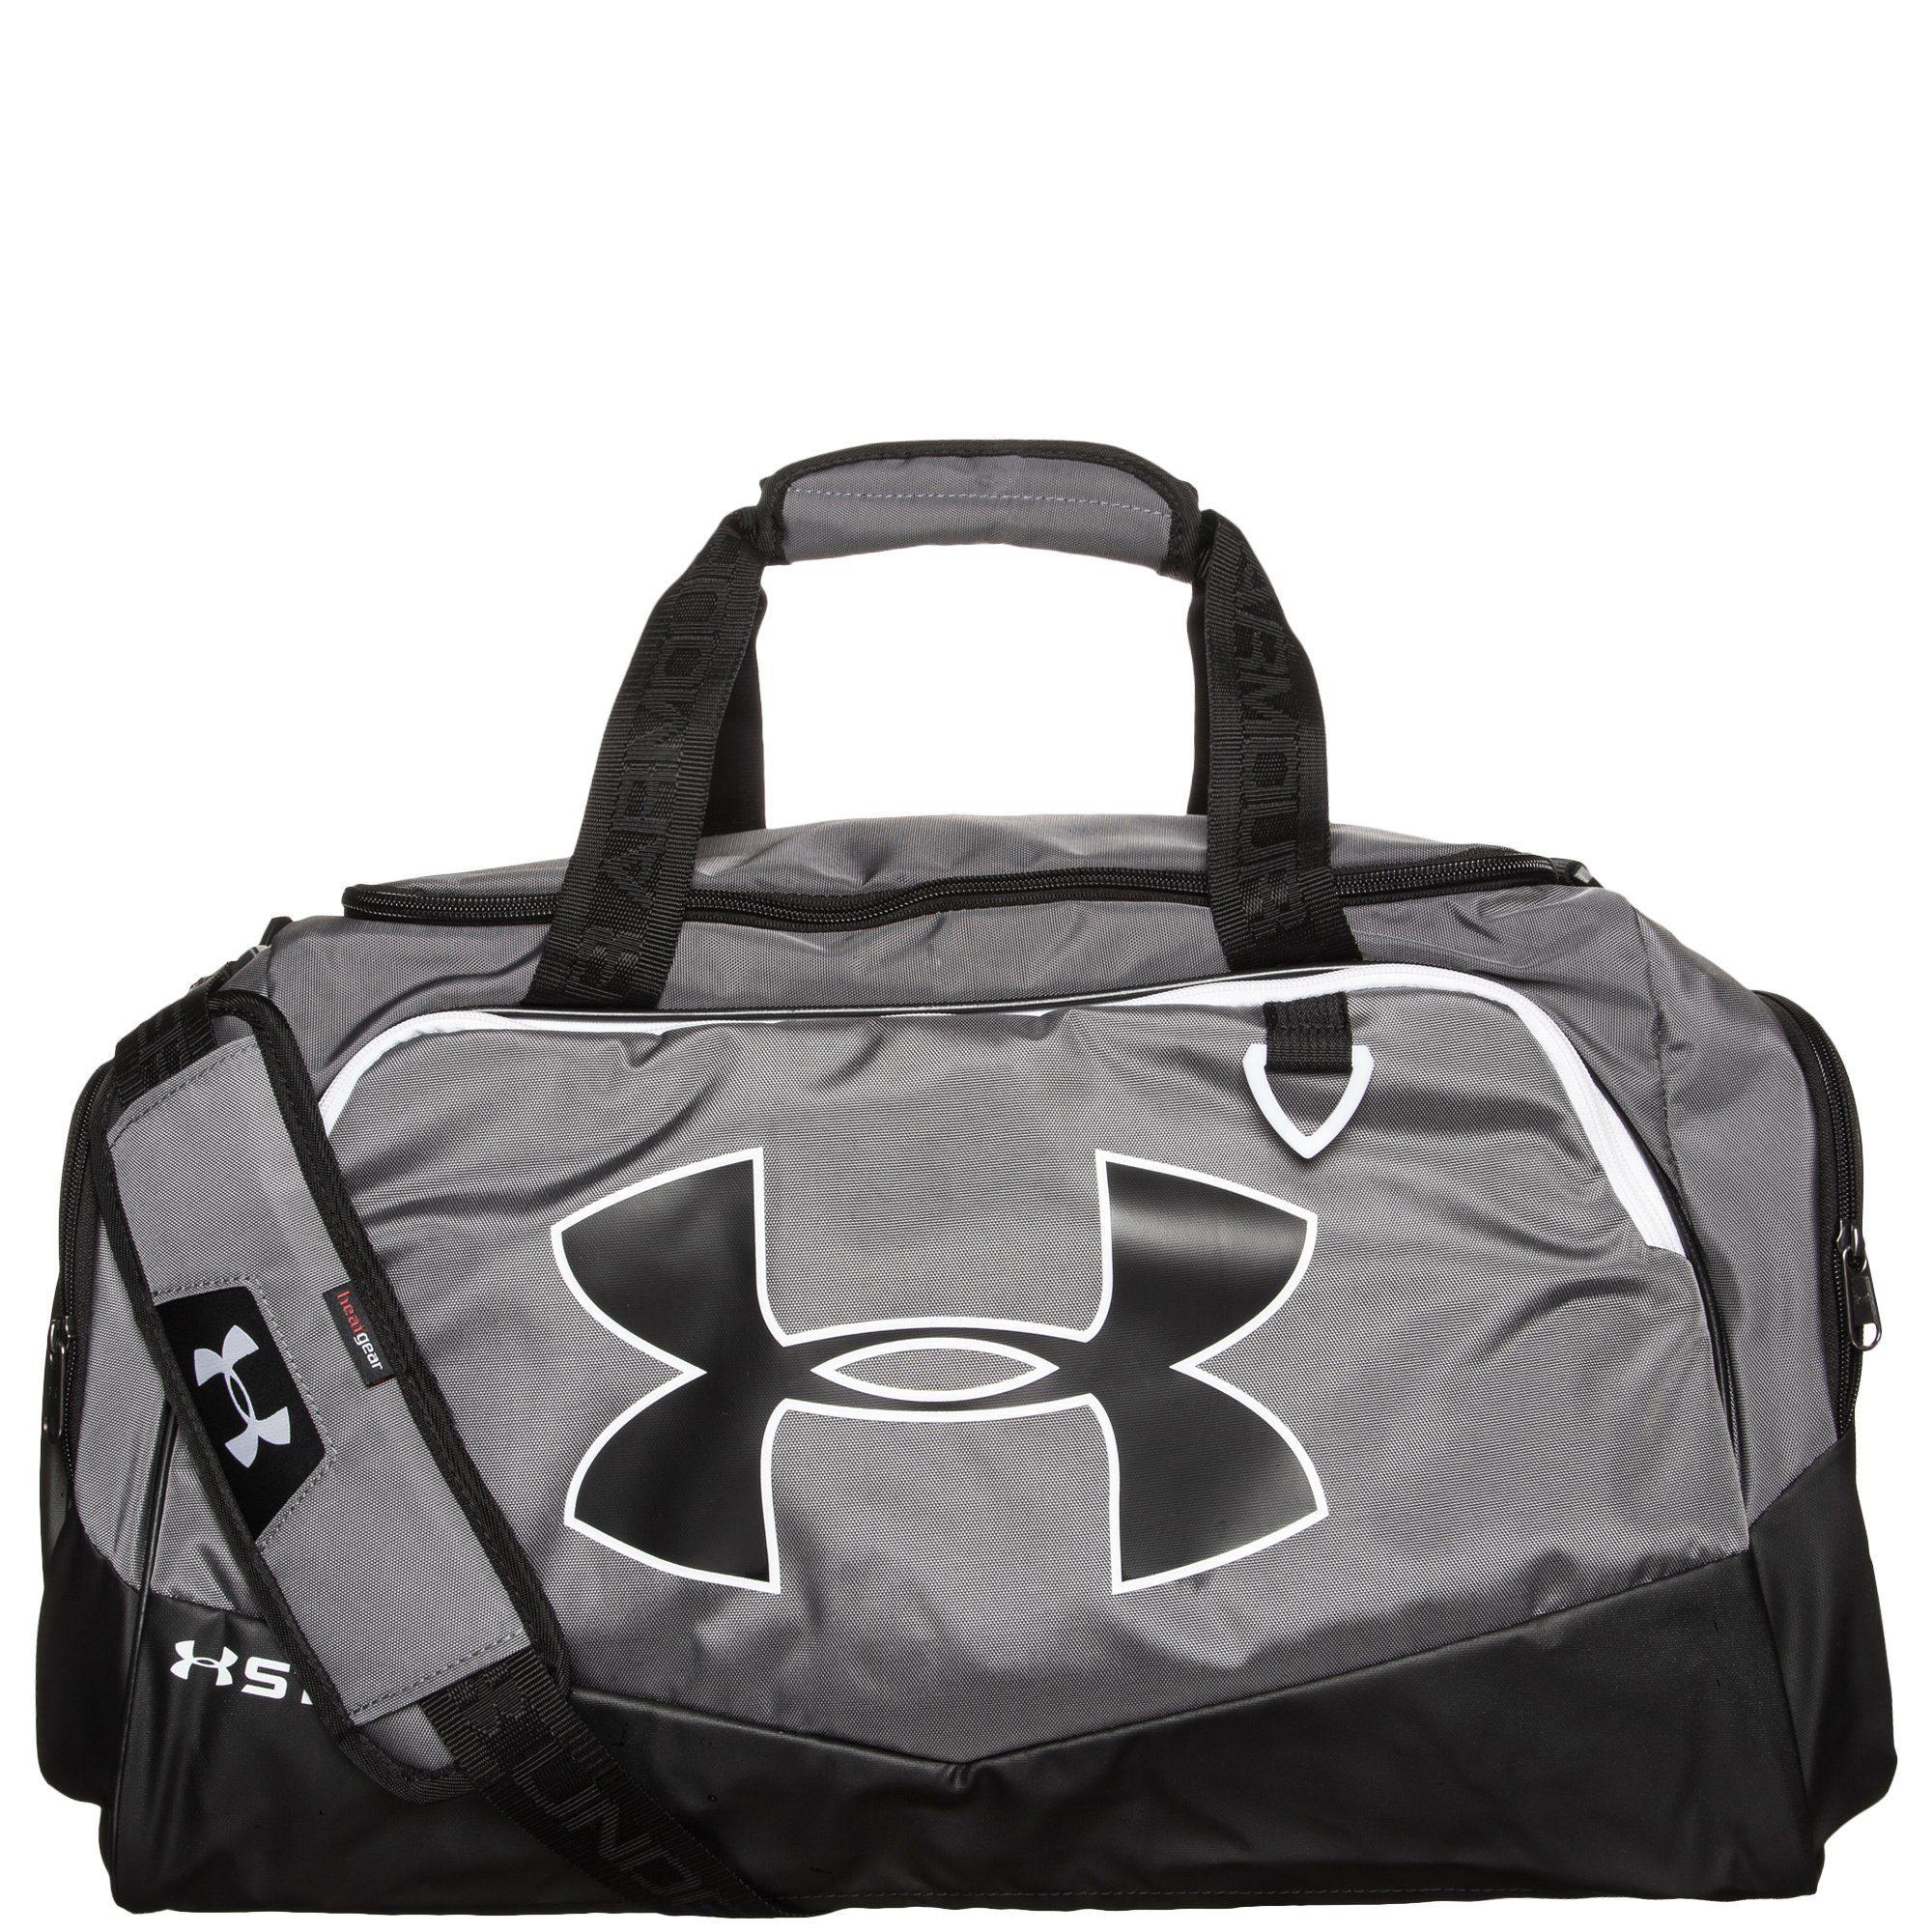 Under Armour® Undeniable Duffel II Sporttasche Medium